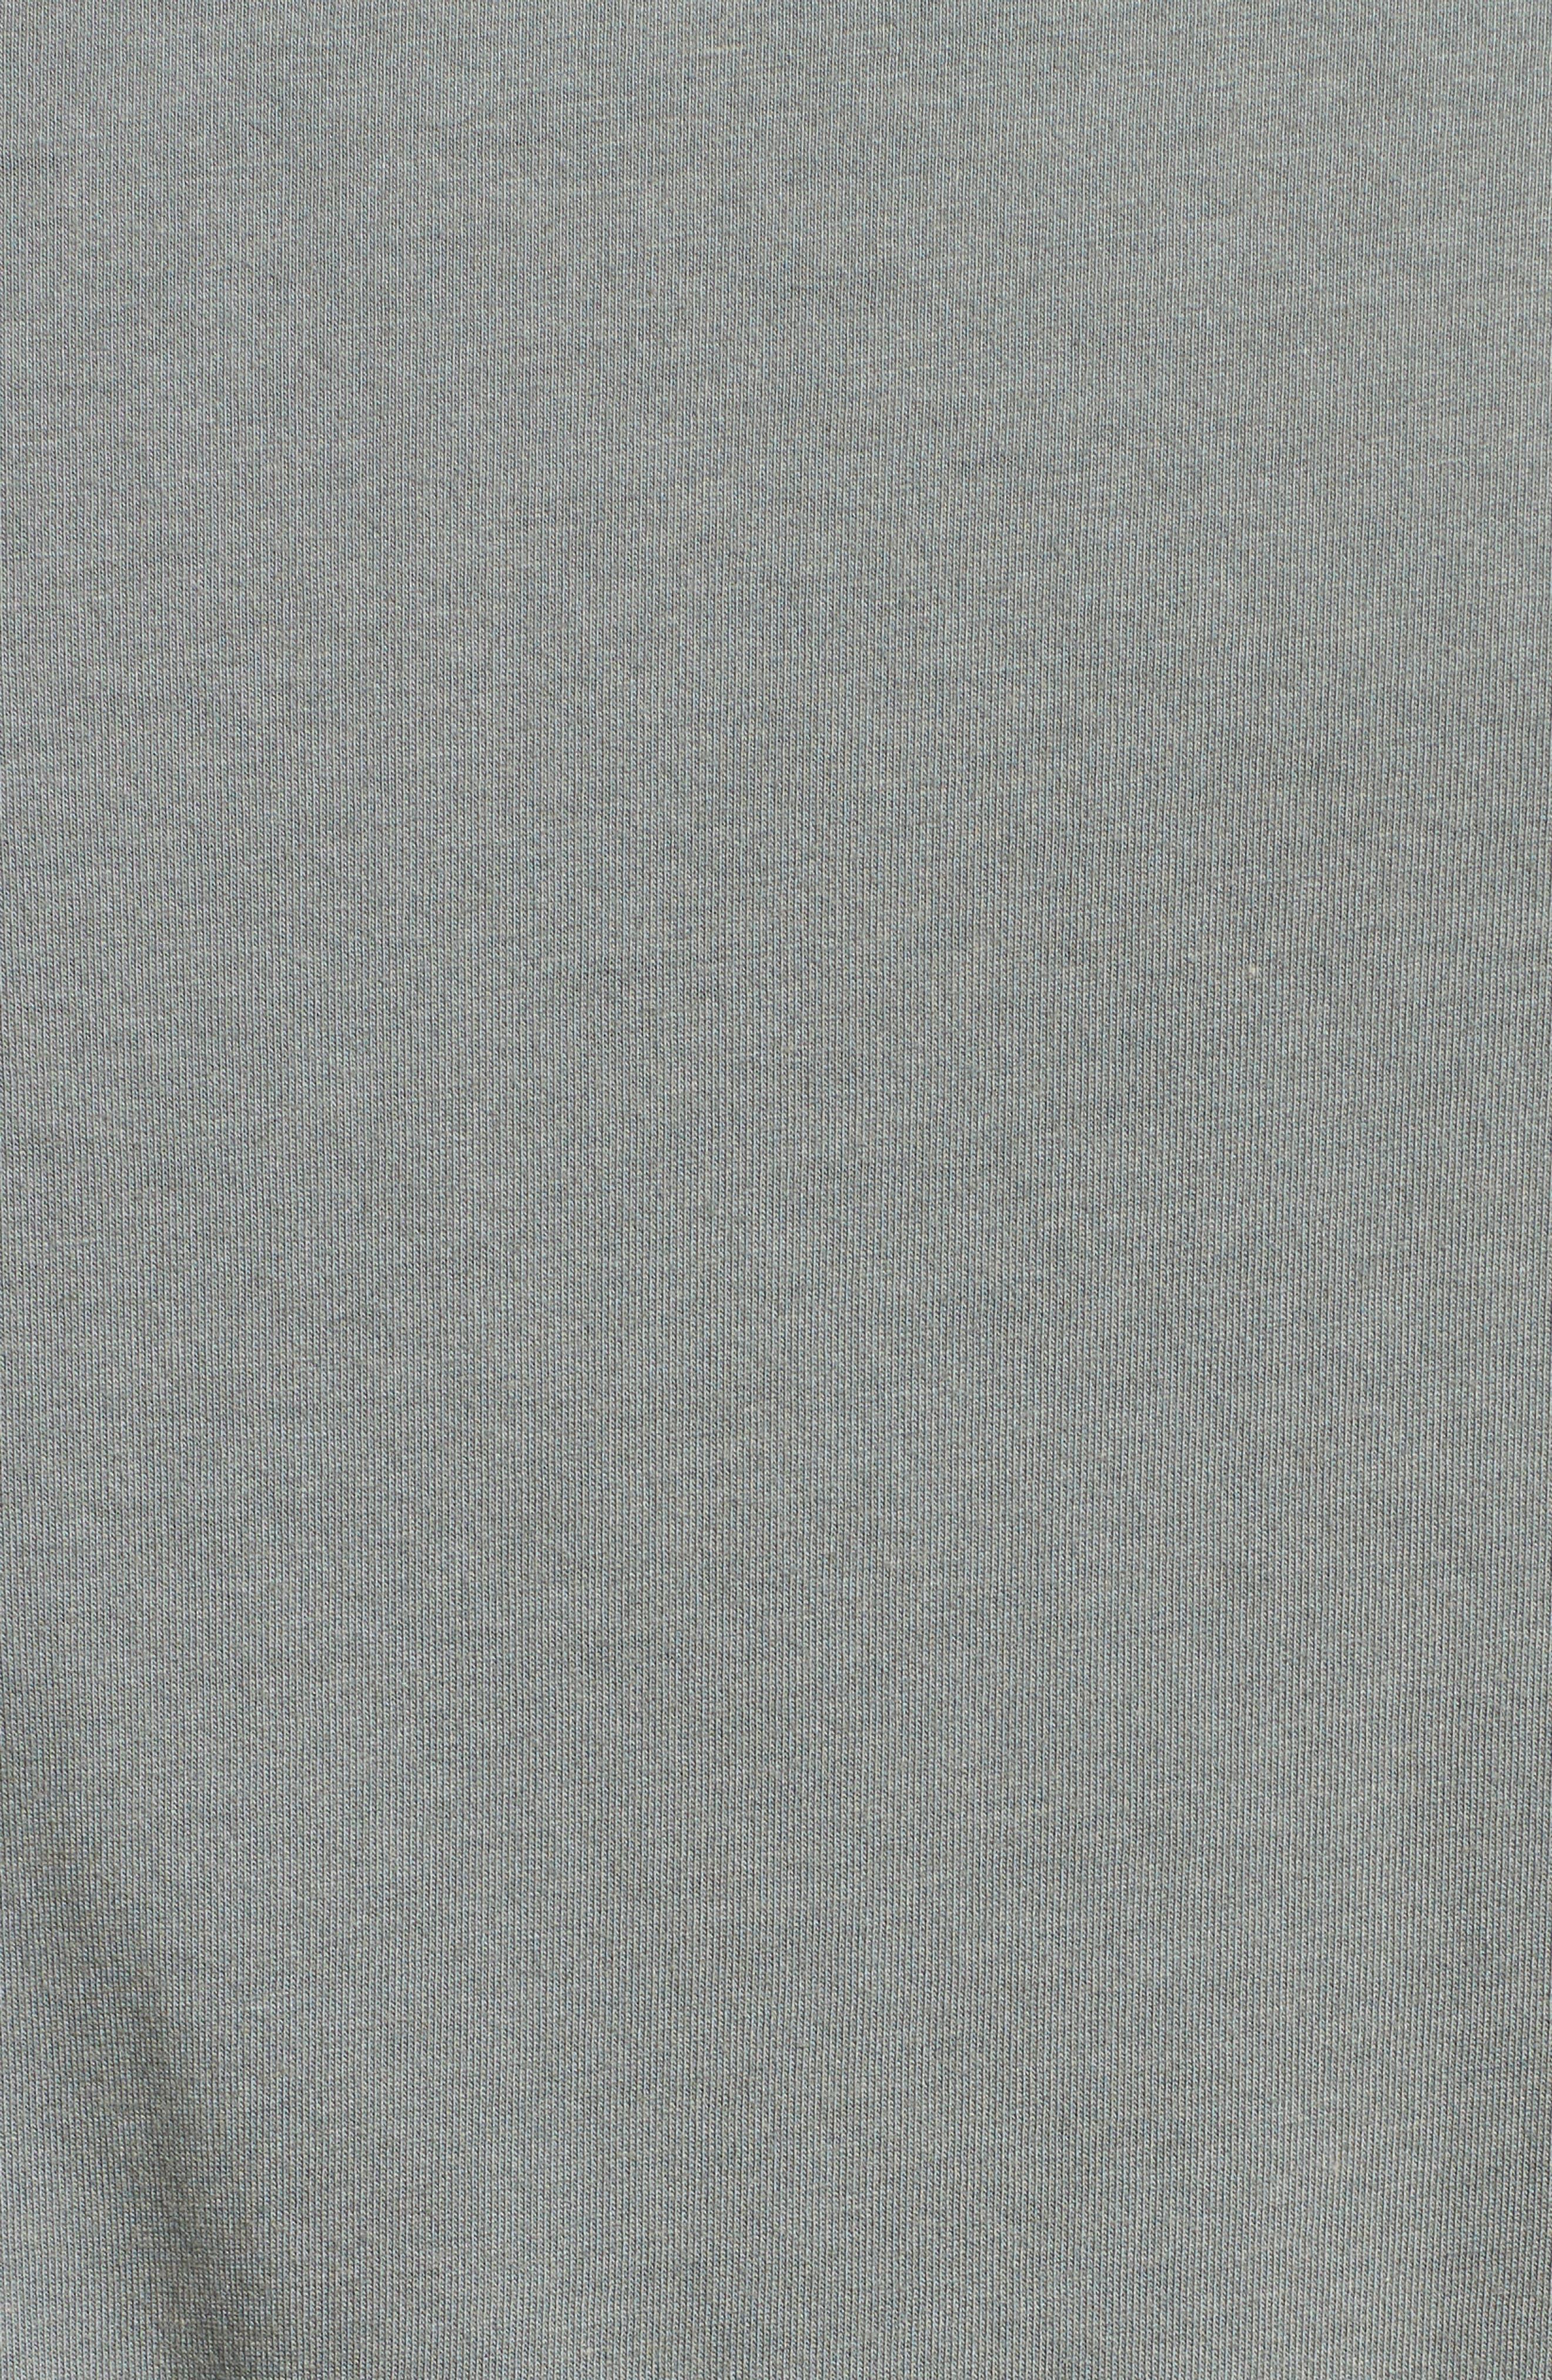 Sliced Sleeve T-Shirt,                             Alternate thumbnail 5, color,                             381